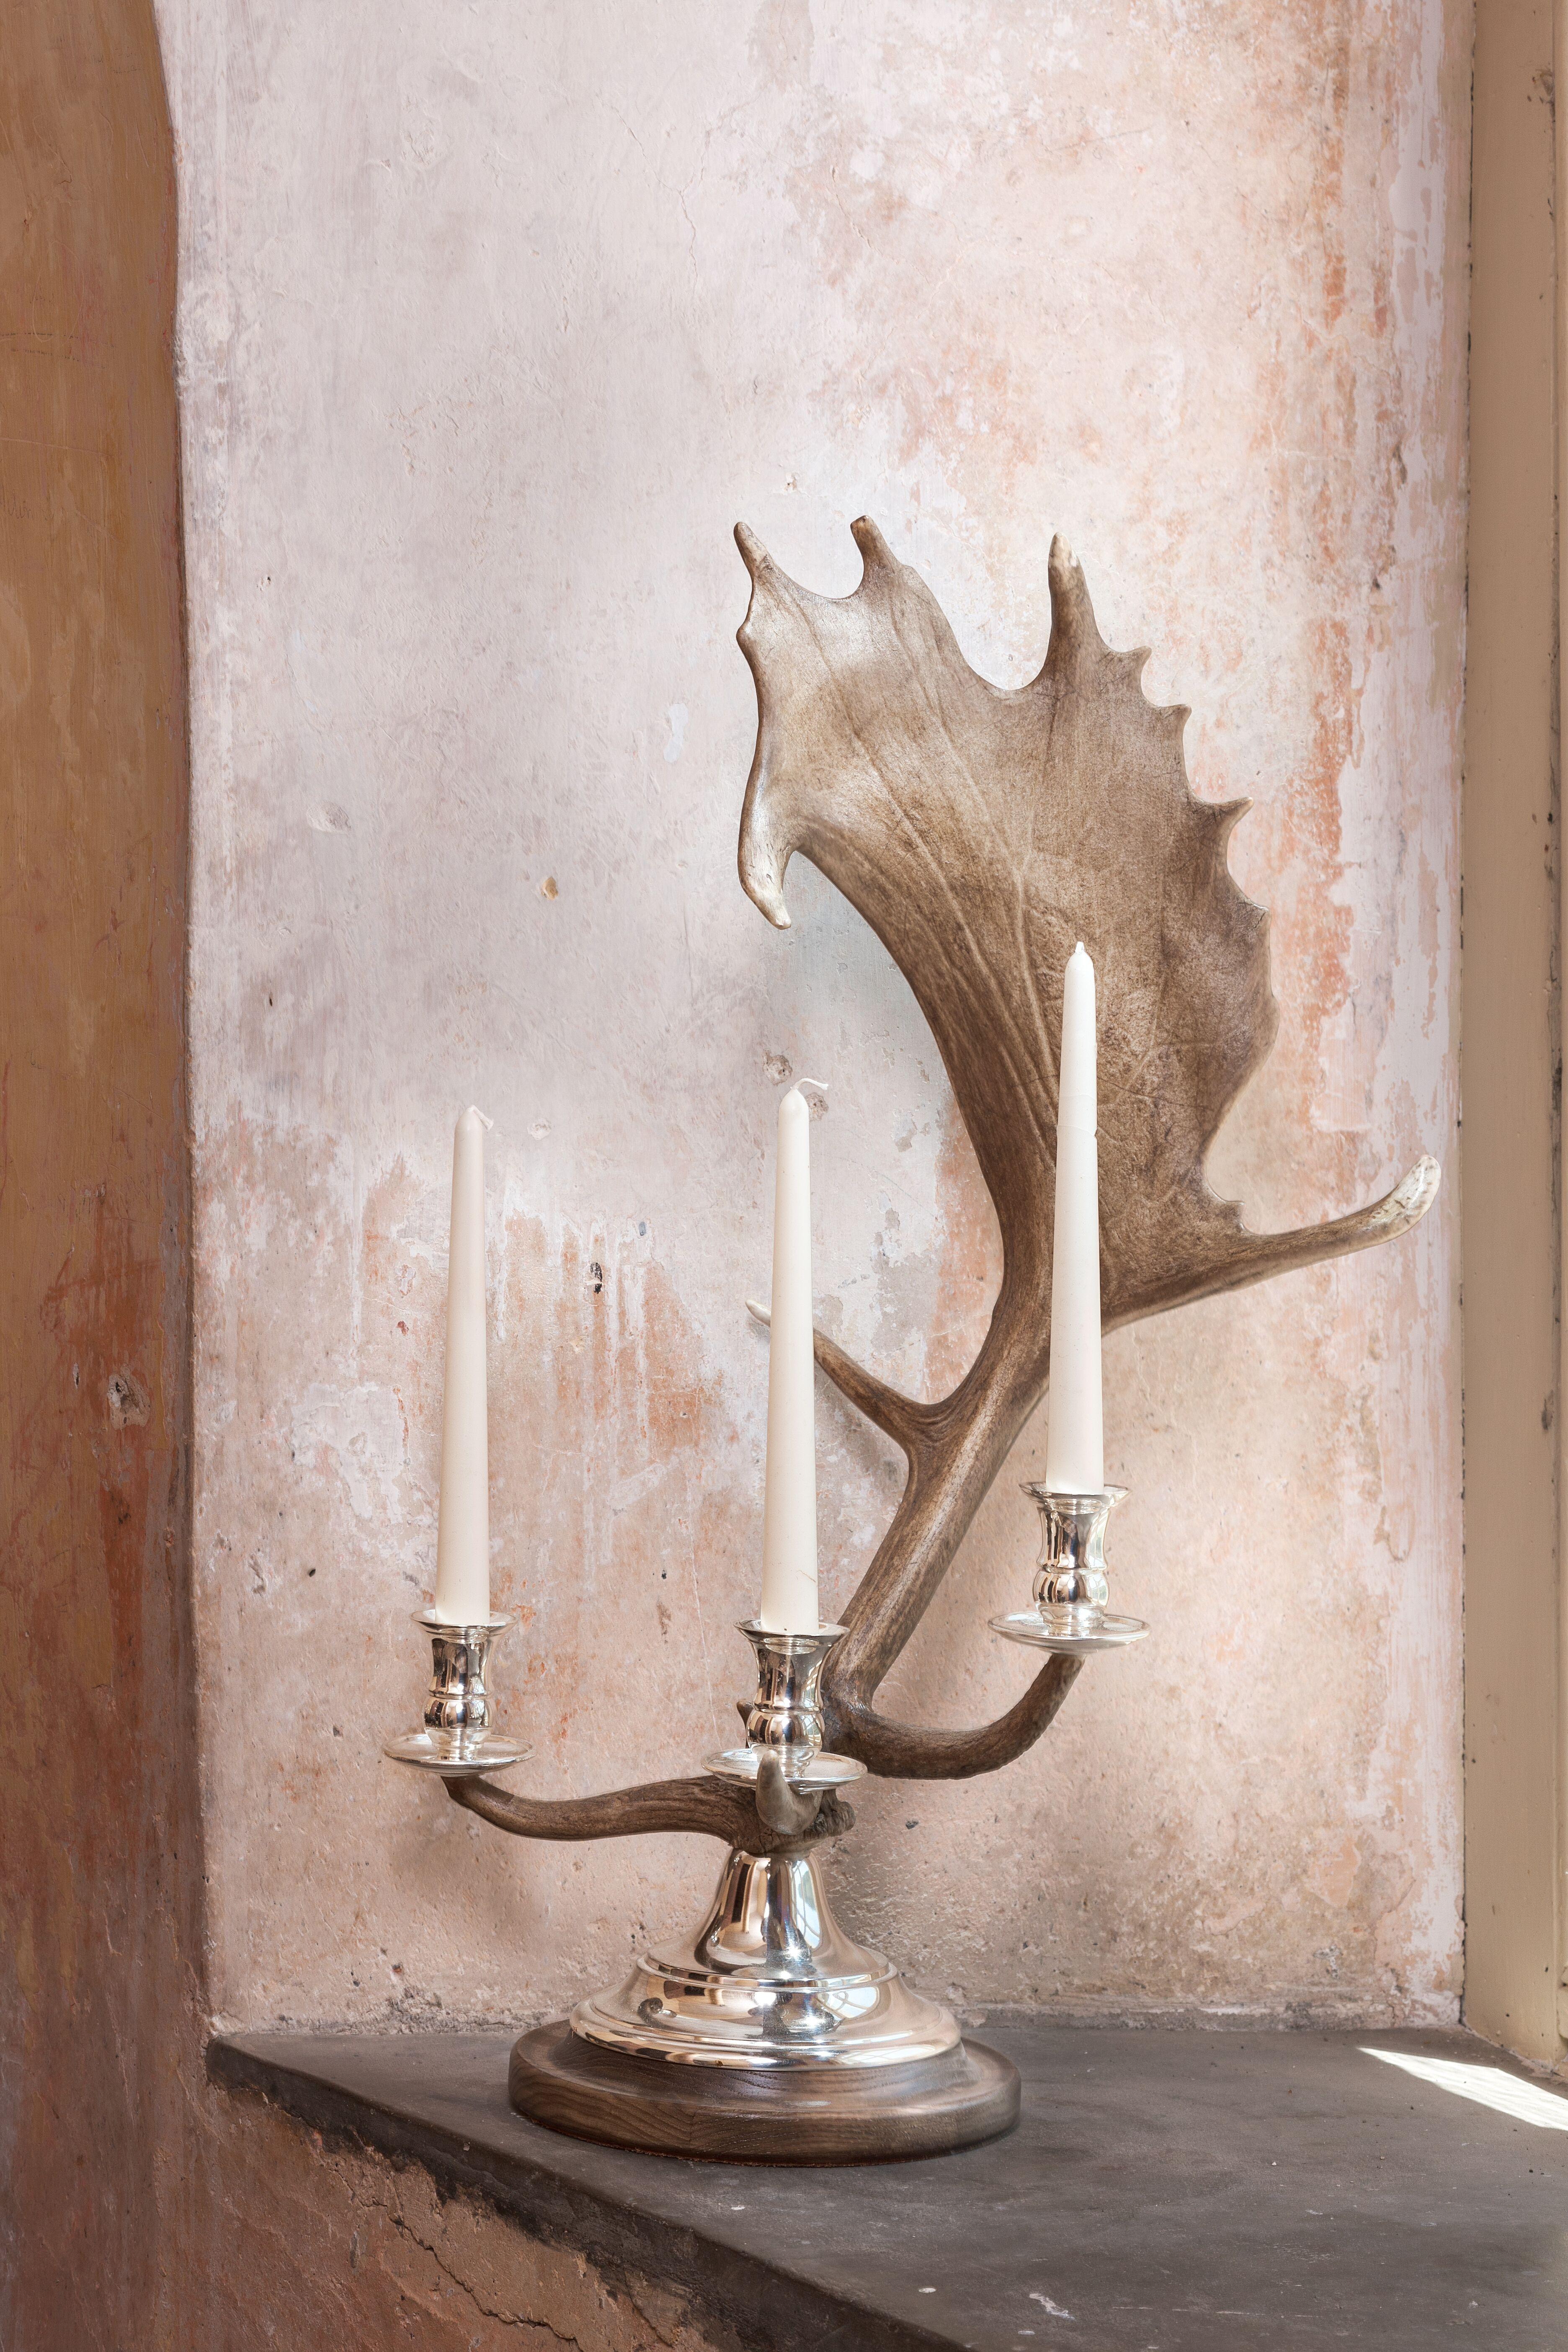 Candlestick - Glencoe 3 -arm